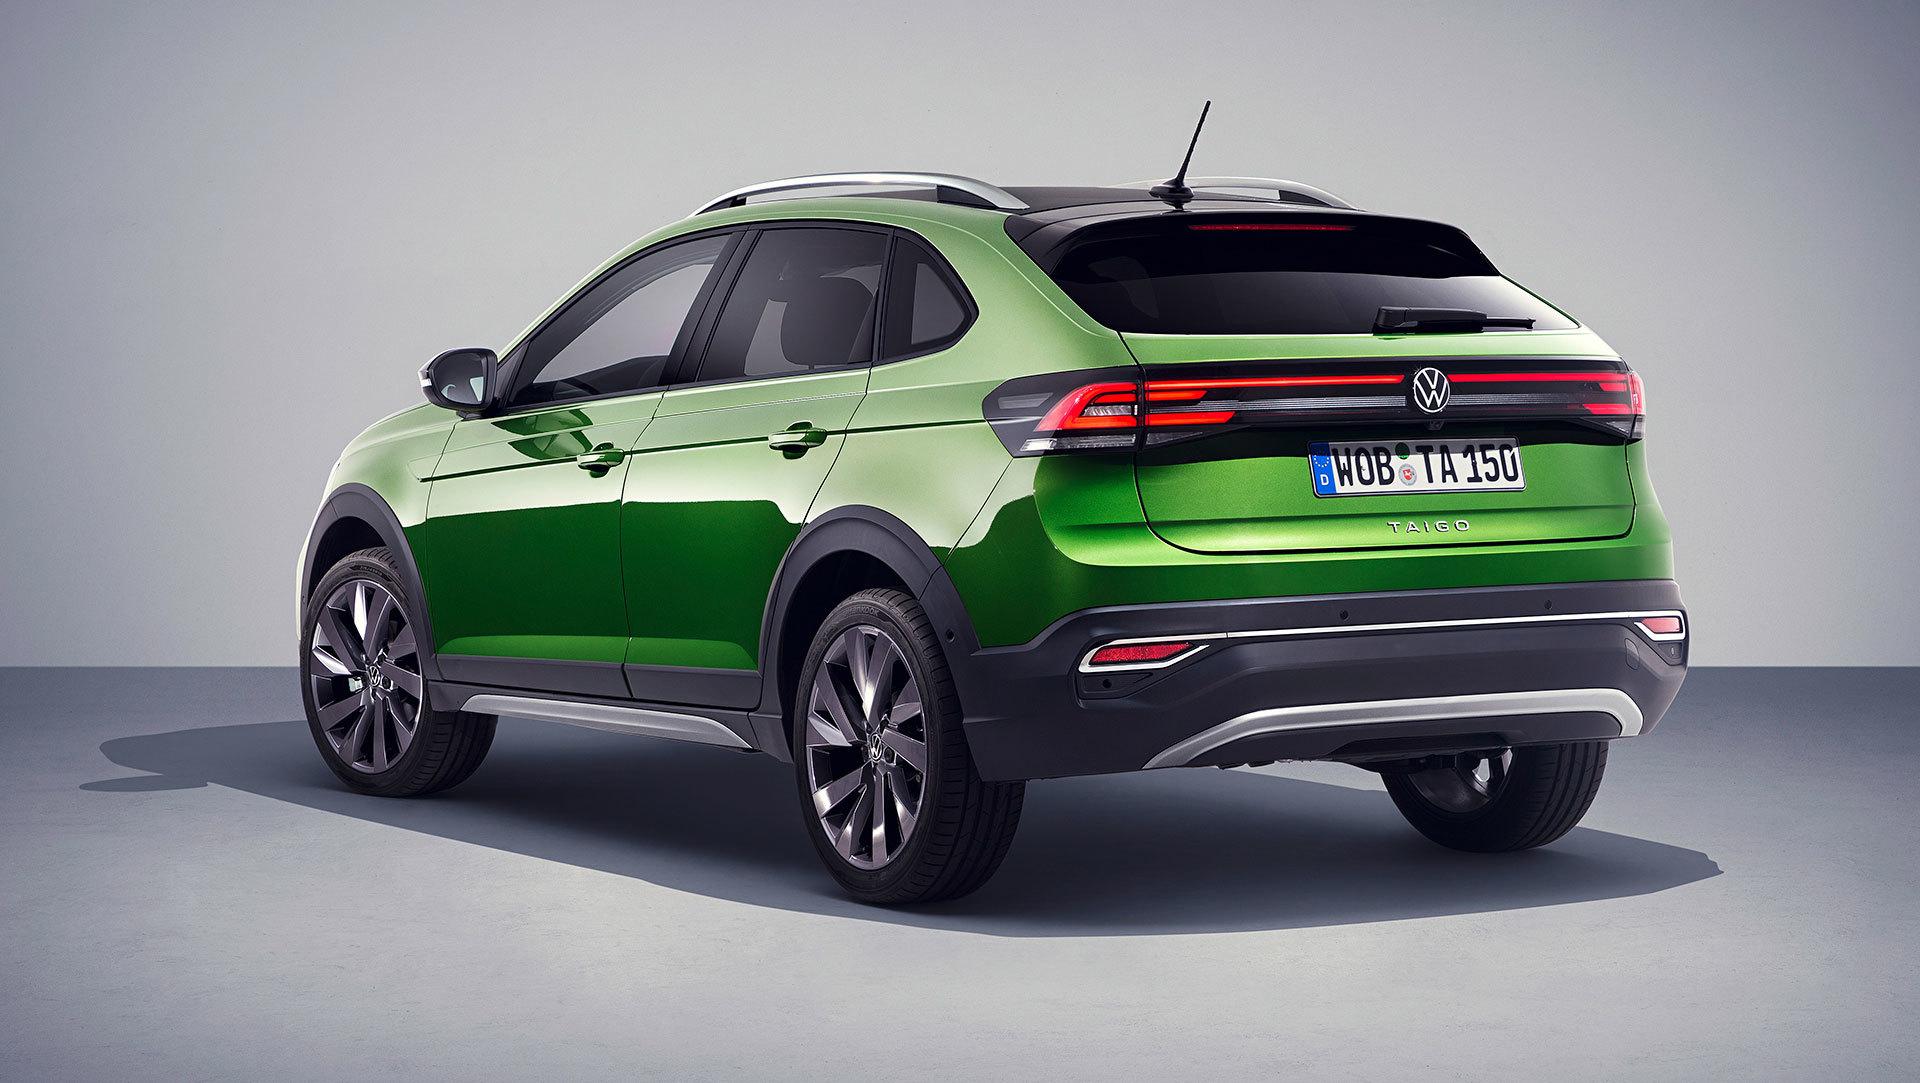 Volkswagen Taigo 2022 Trasera Verde Visual Green 02